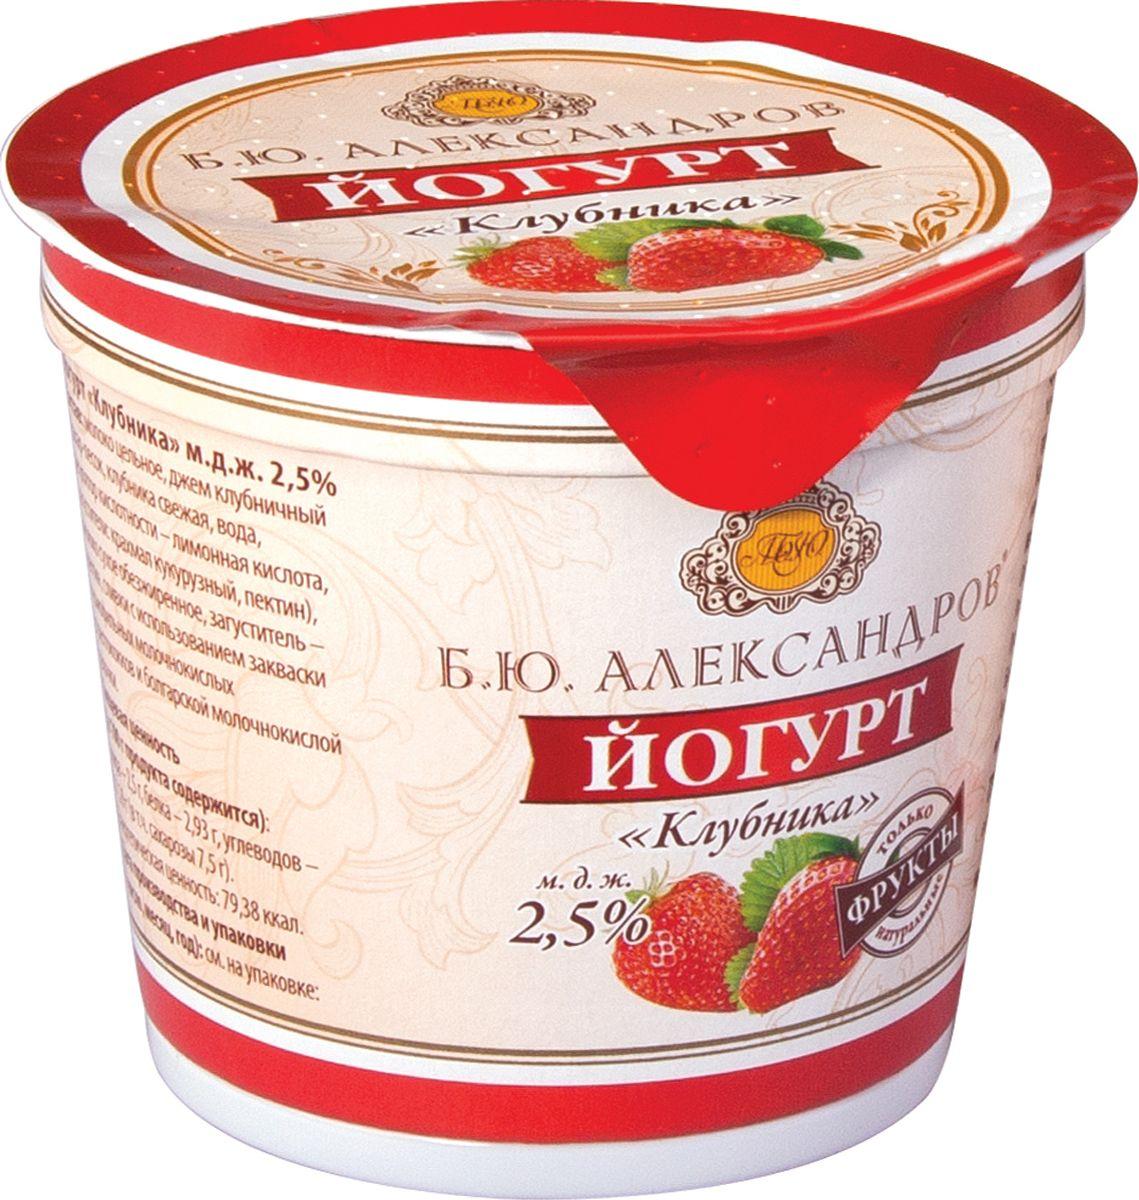 Б.Ю.Александров Йогурт Клубника 2,5%, 125 г йогурт чудо двухслойный клубника 2 5